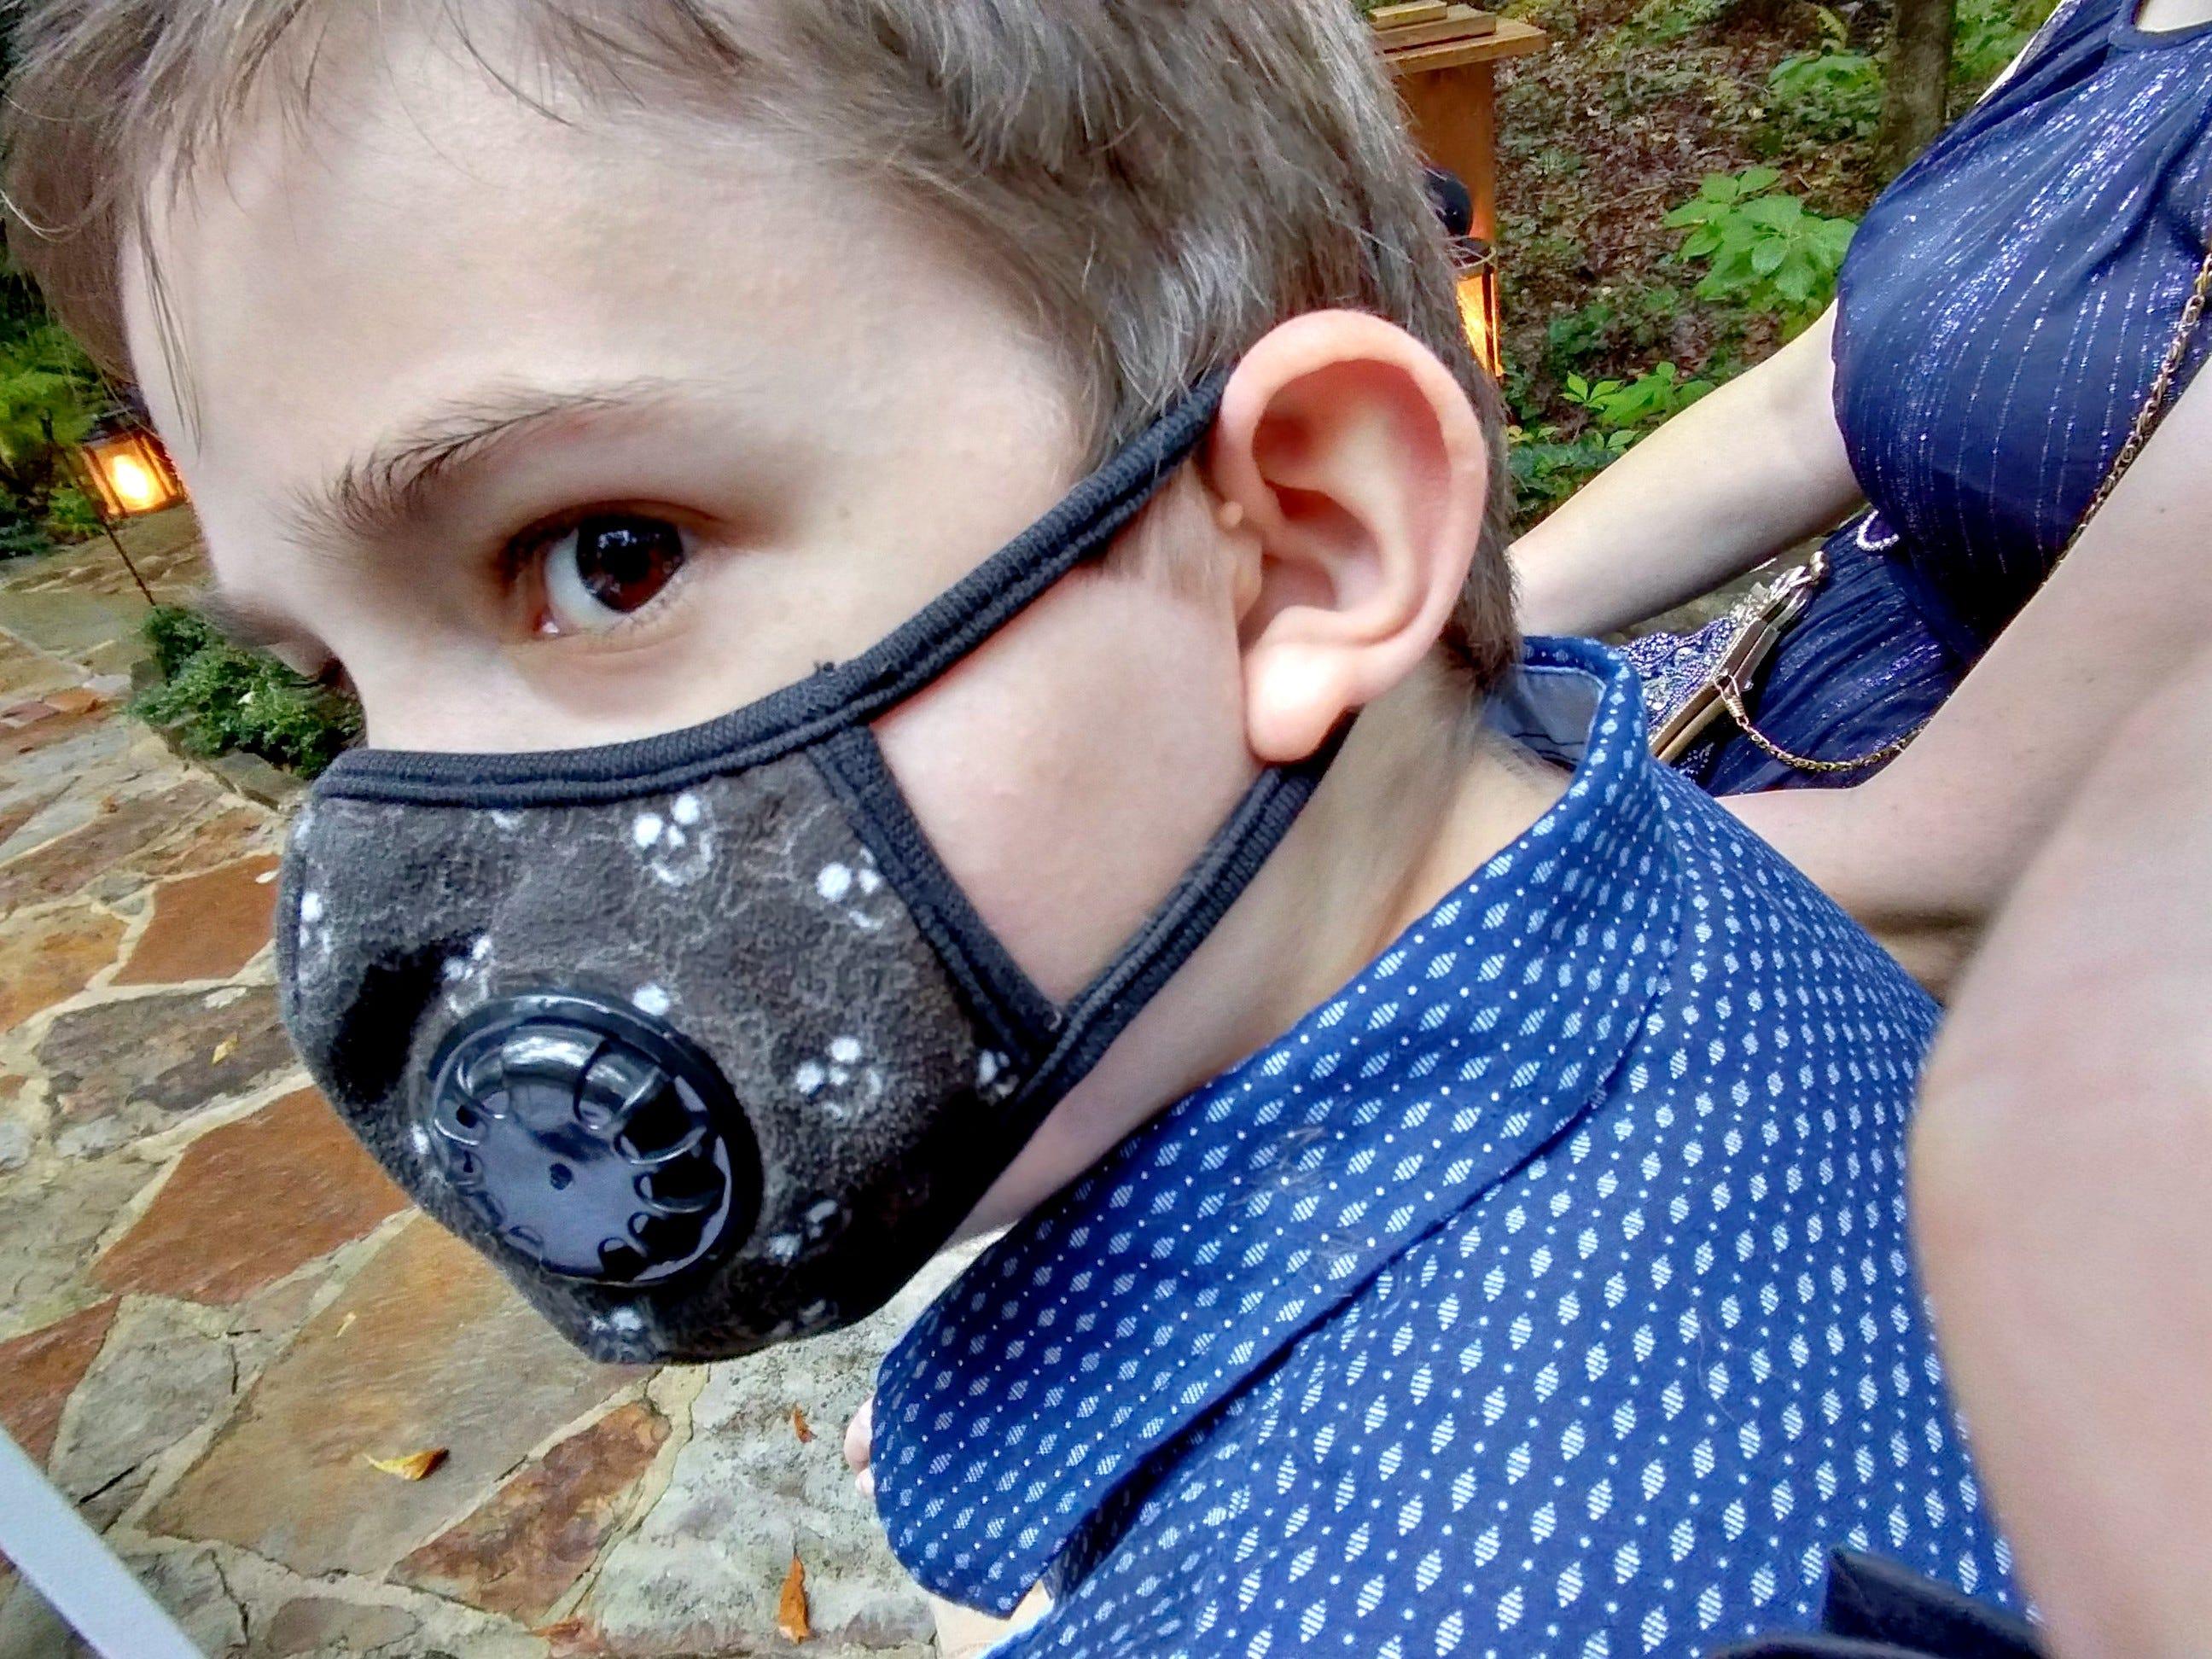 A closeup of a cute little kid wearing a mask